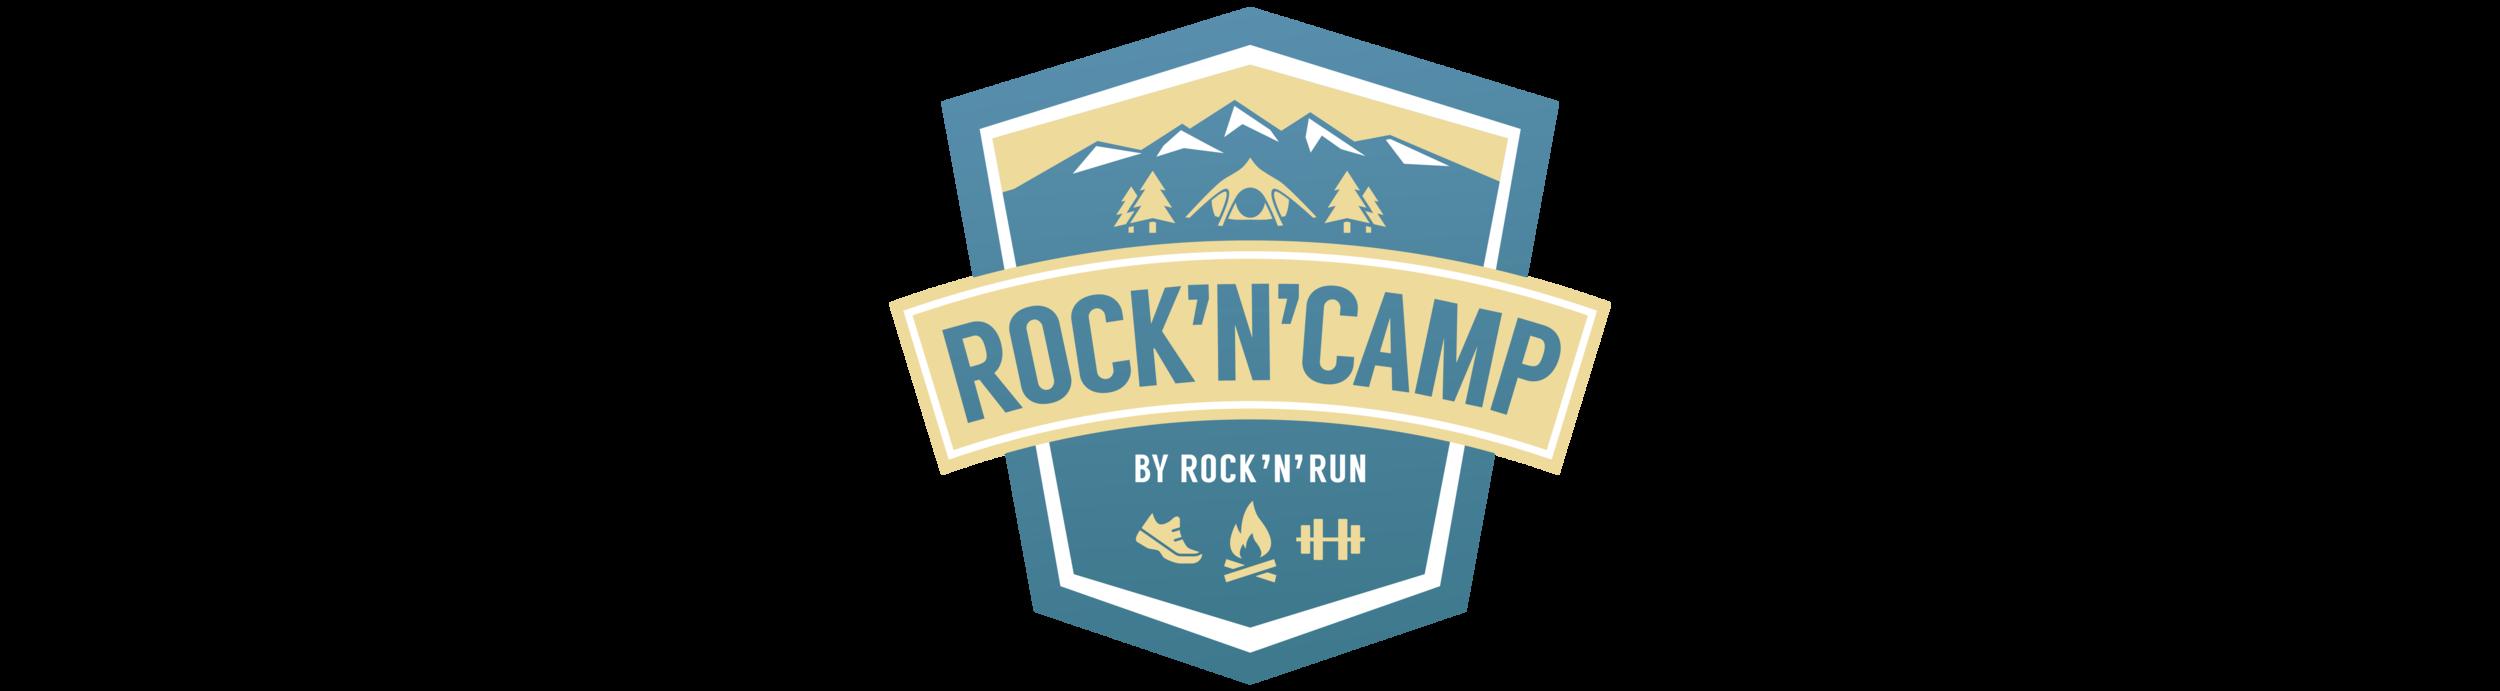 rockncamp_logo_2019_cmyk_2.1_breit.png